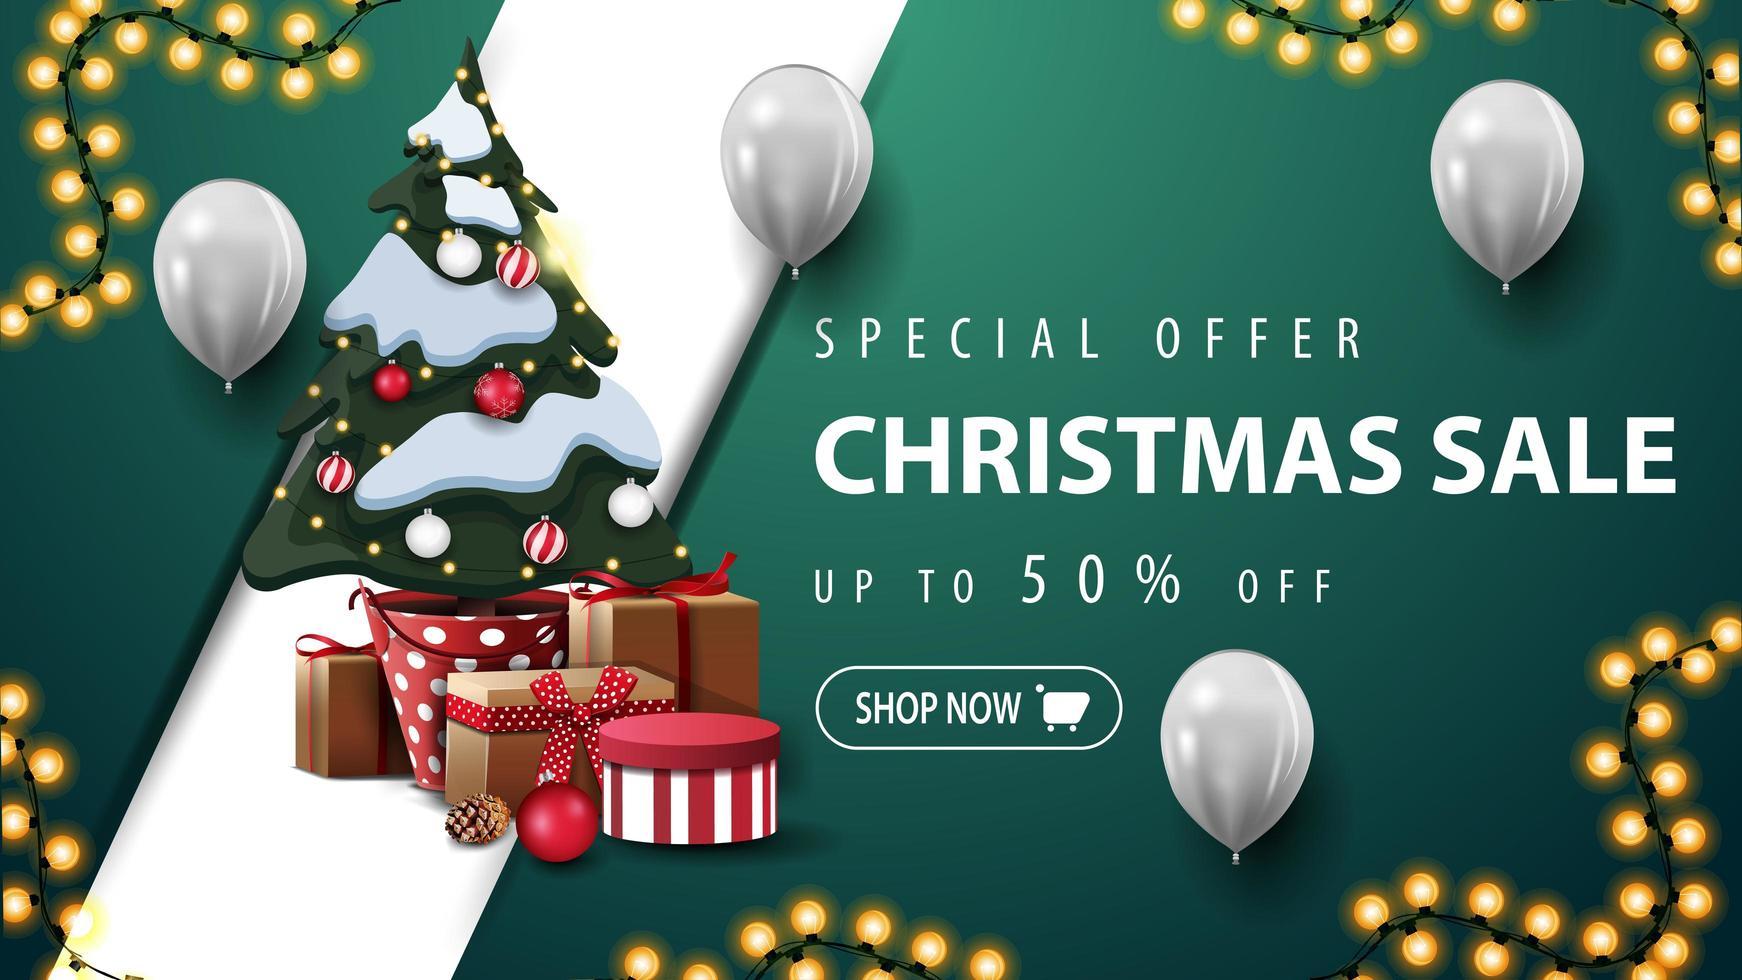 kortingsbanner met slinger, ballonnen en kerstboom vector